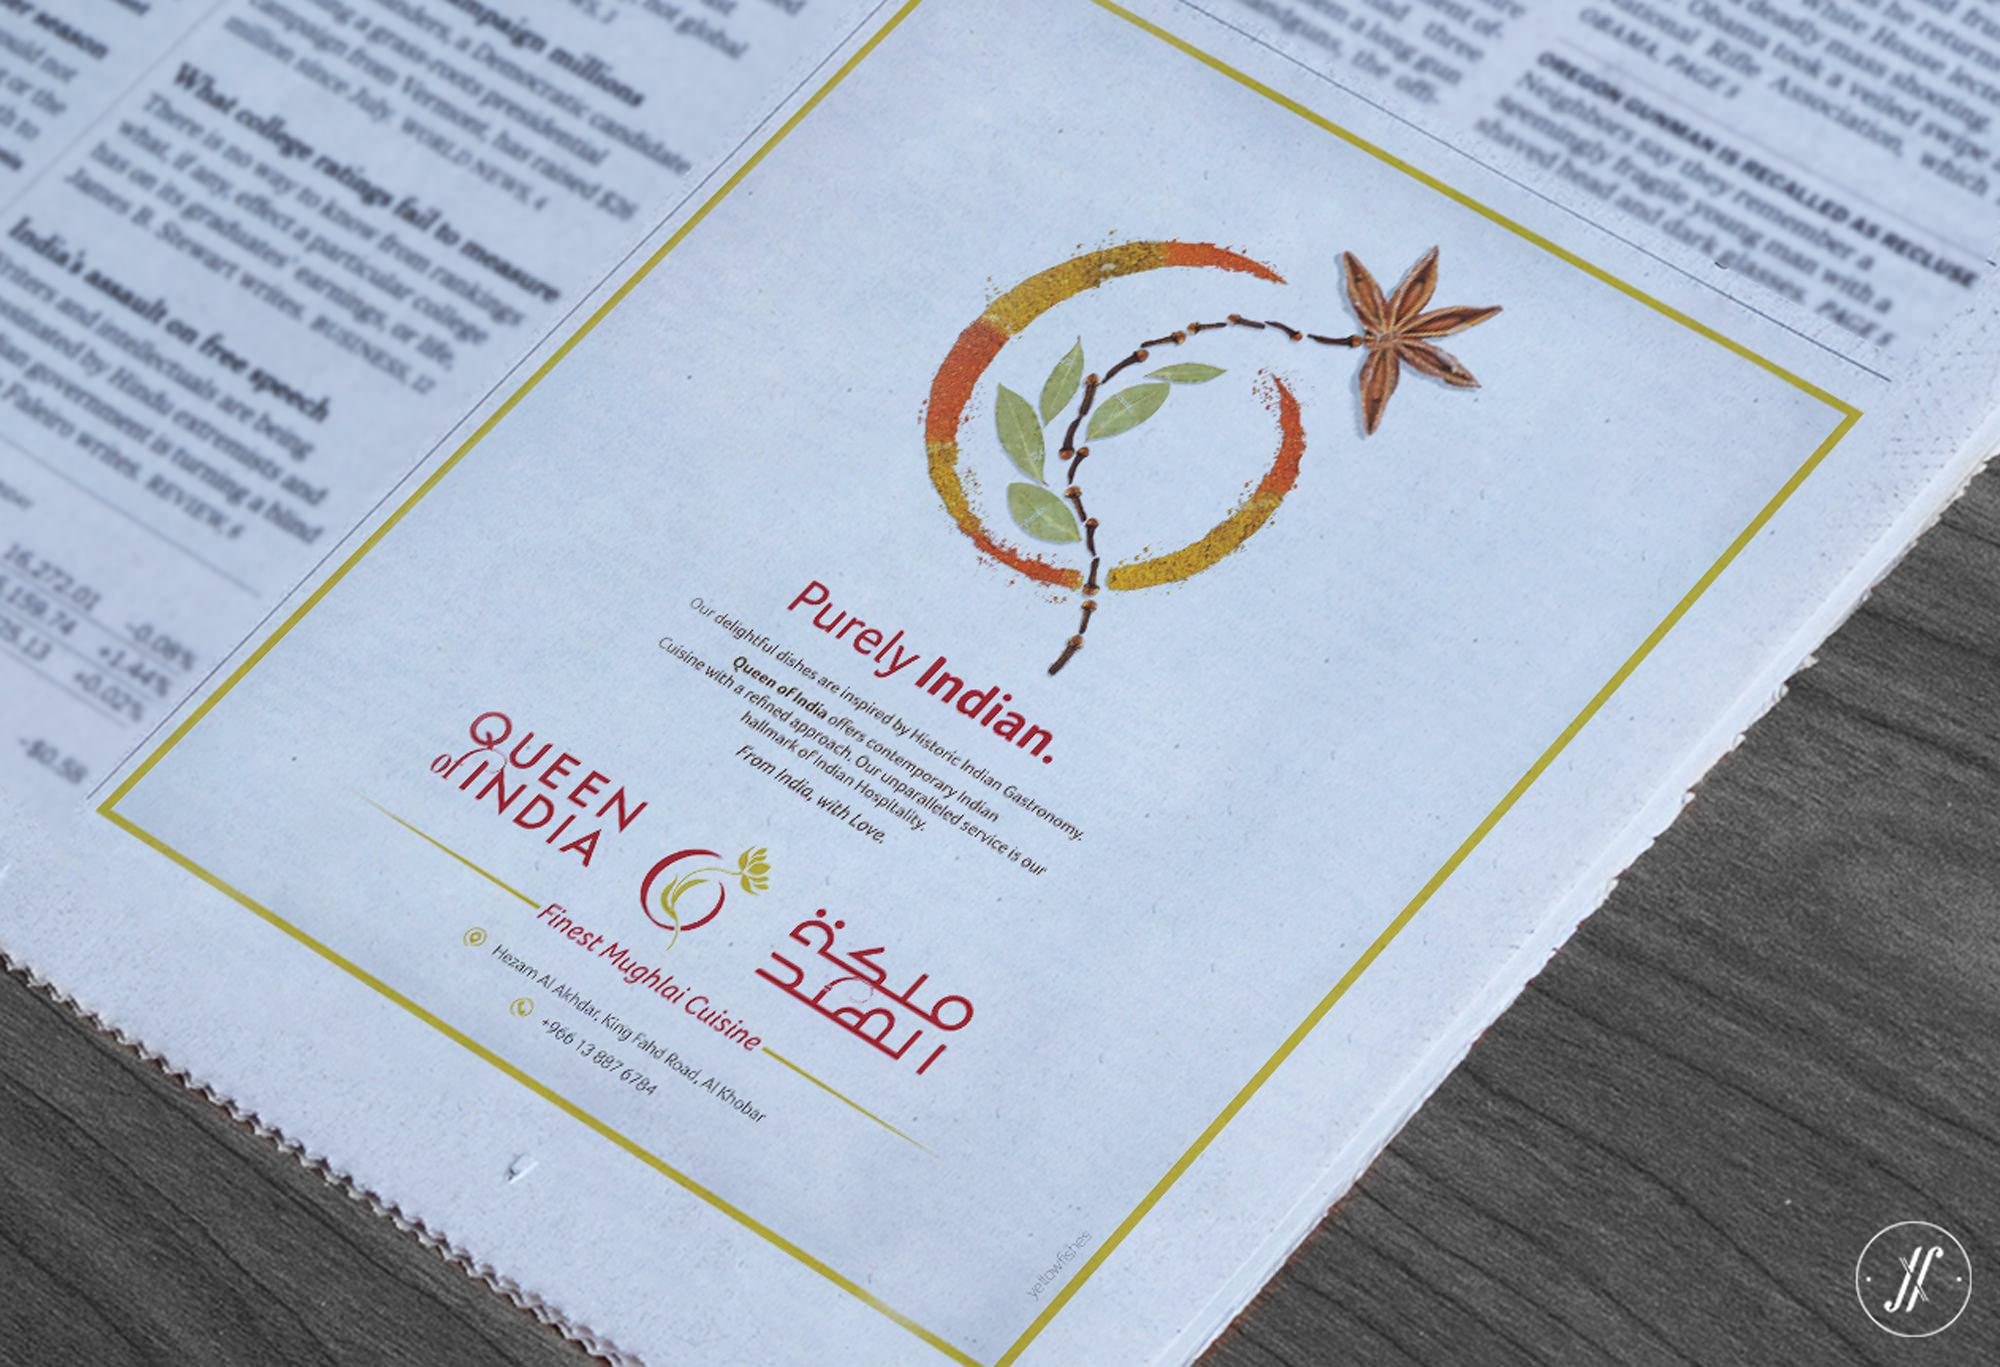 Yellow Fishes Branding Agency In Mumbai Queen of India Restaurant Branding design firm Saudi Arabia restaurant Branding print ad design newspaper ad design logo design.jpg